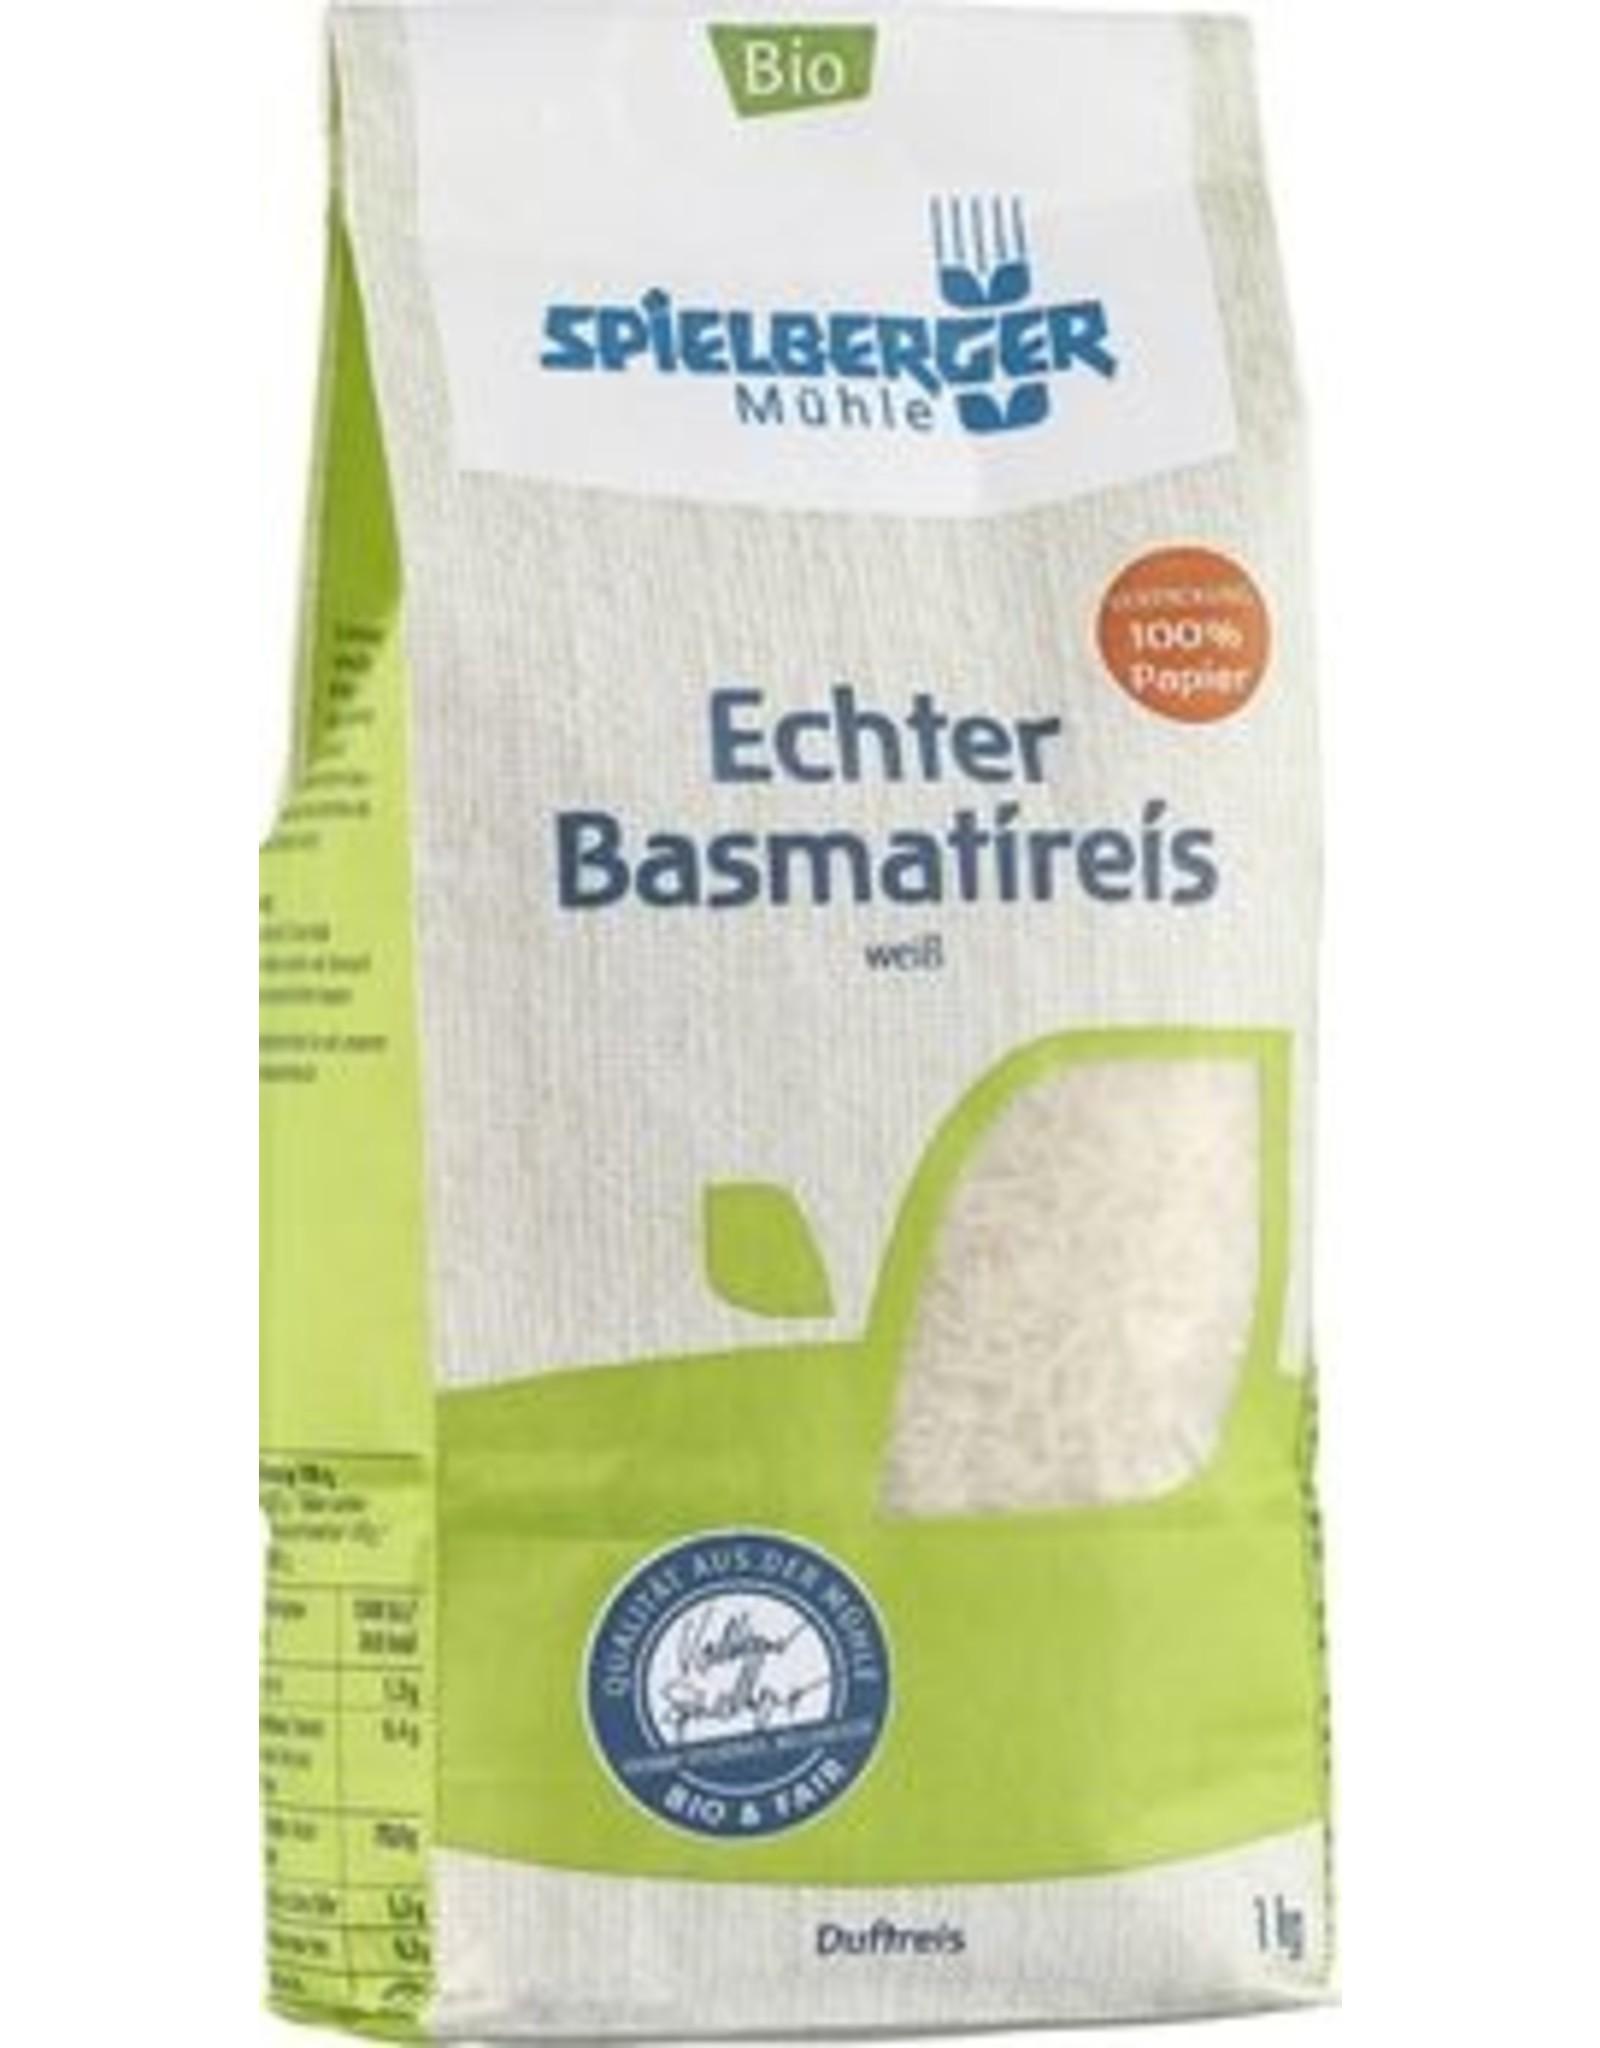 SPIELBERGER Arroz basmati, blanco, orgánico 1kg